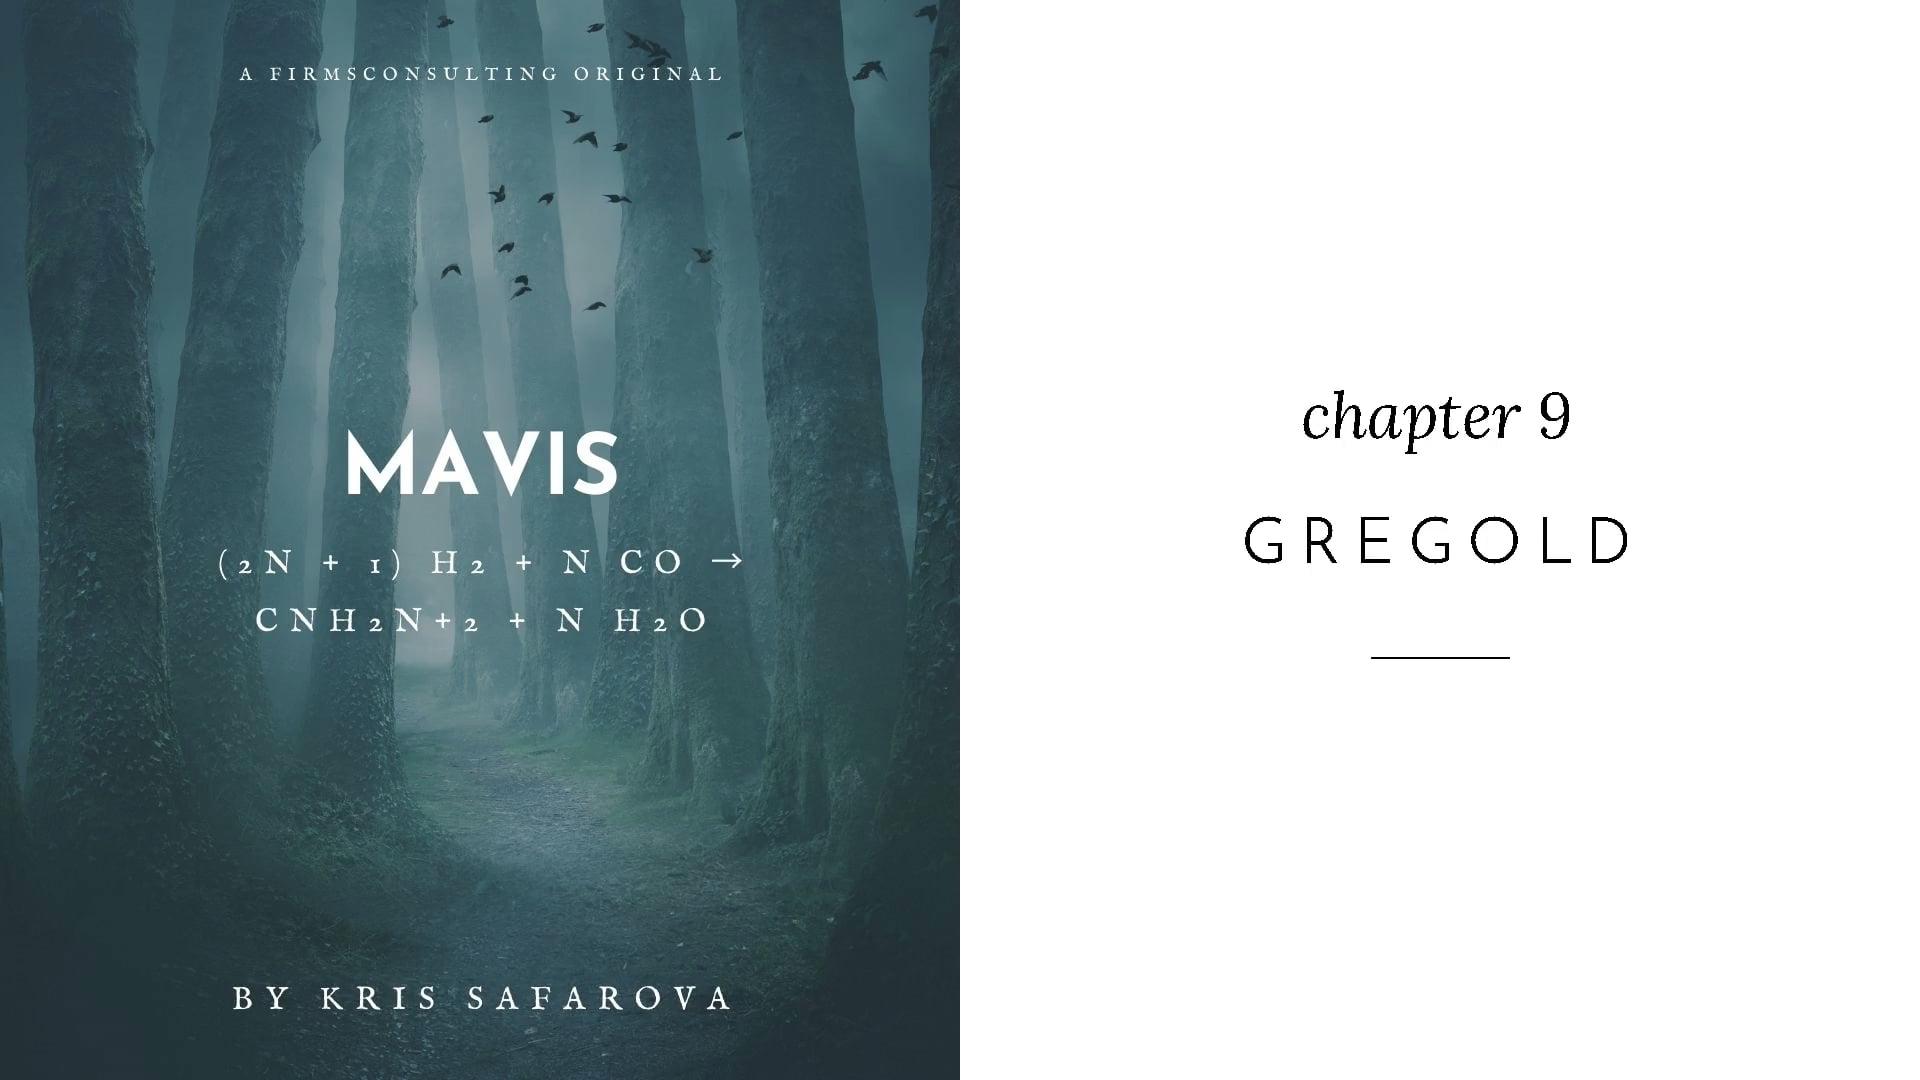 012 Mavis Chapter 9 Gregold